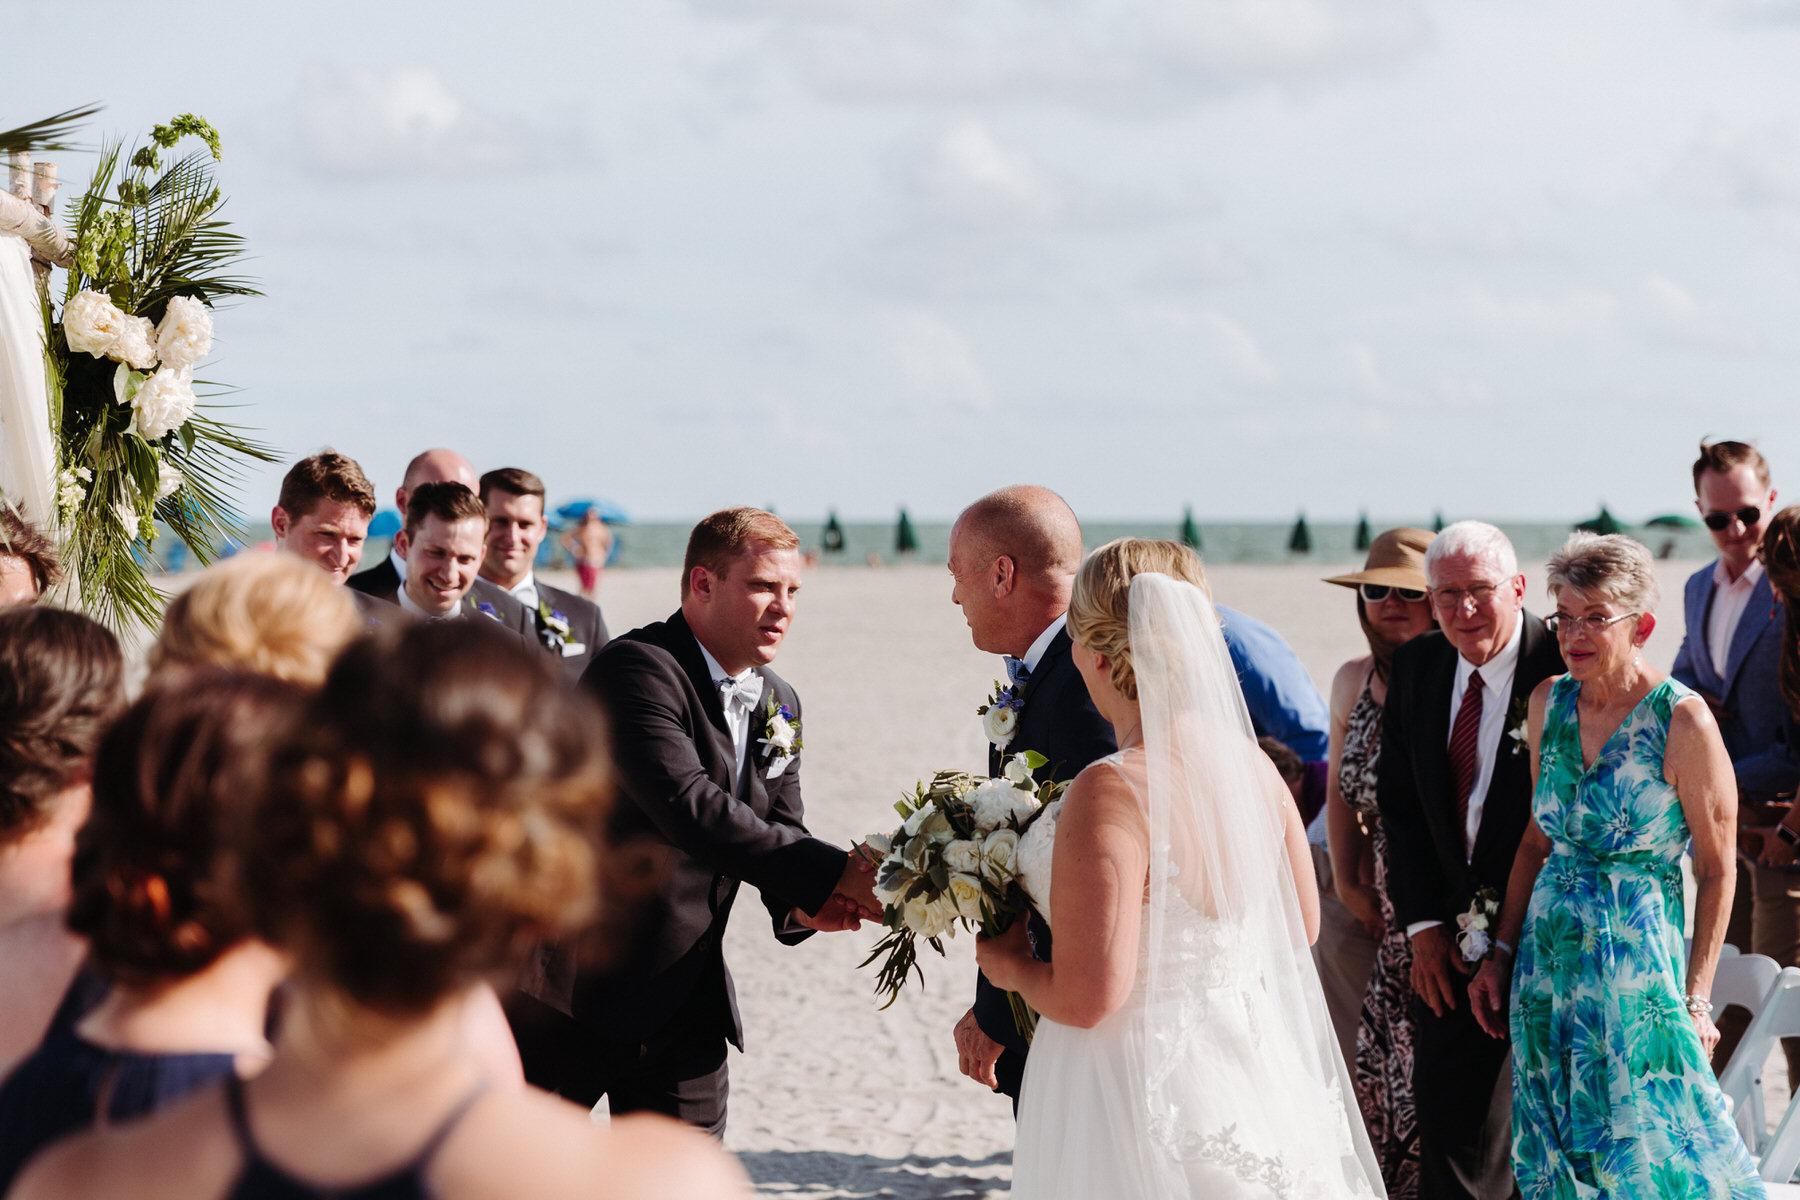 wild-dunes-charleston-isle-of-palms-IOP-wedding-797.JPG